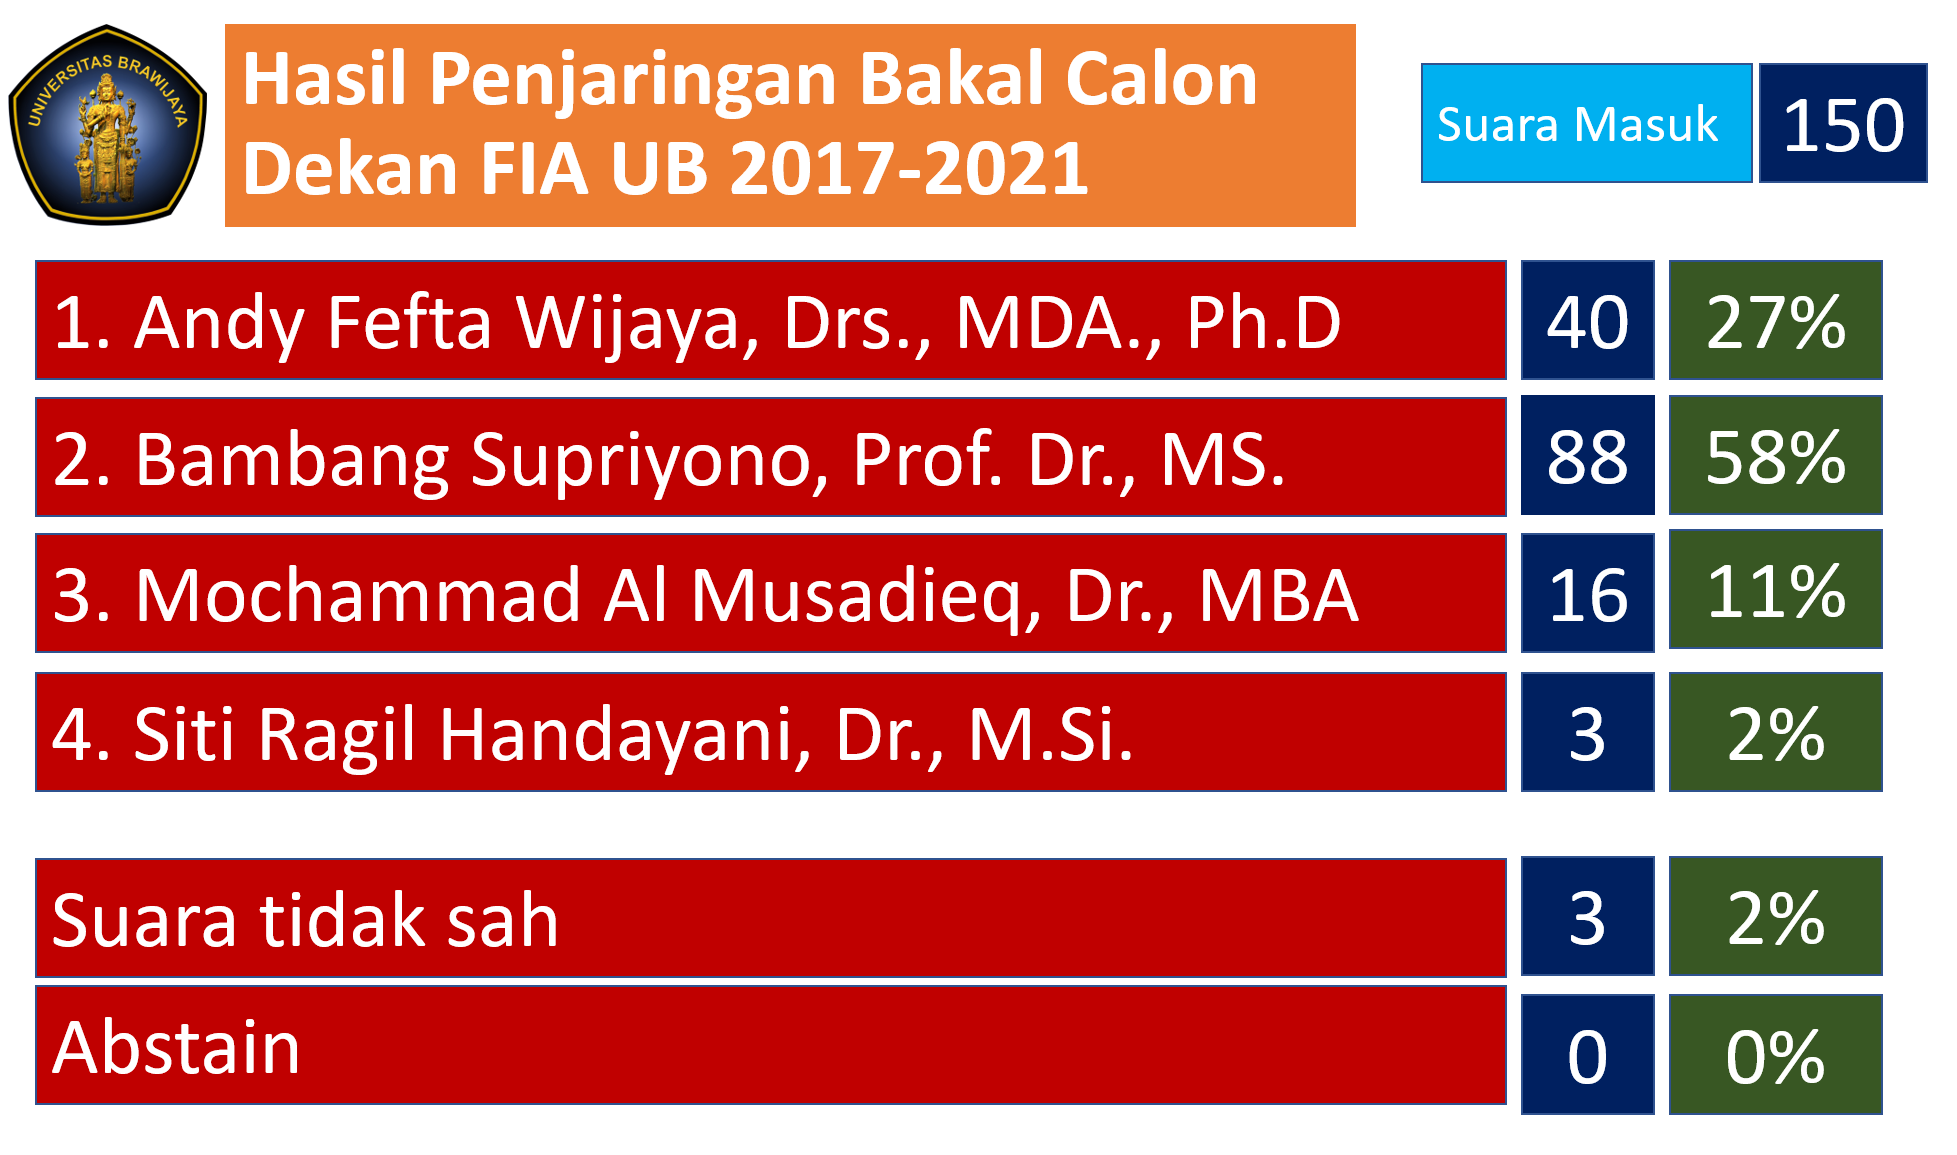 Prof Bambang Supriyono Unggul Dalam Penjaringan Bakal Calon Dekan FIA UB 2017-2021